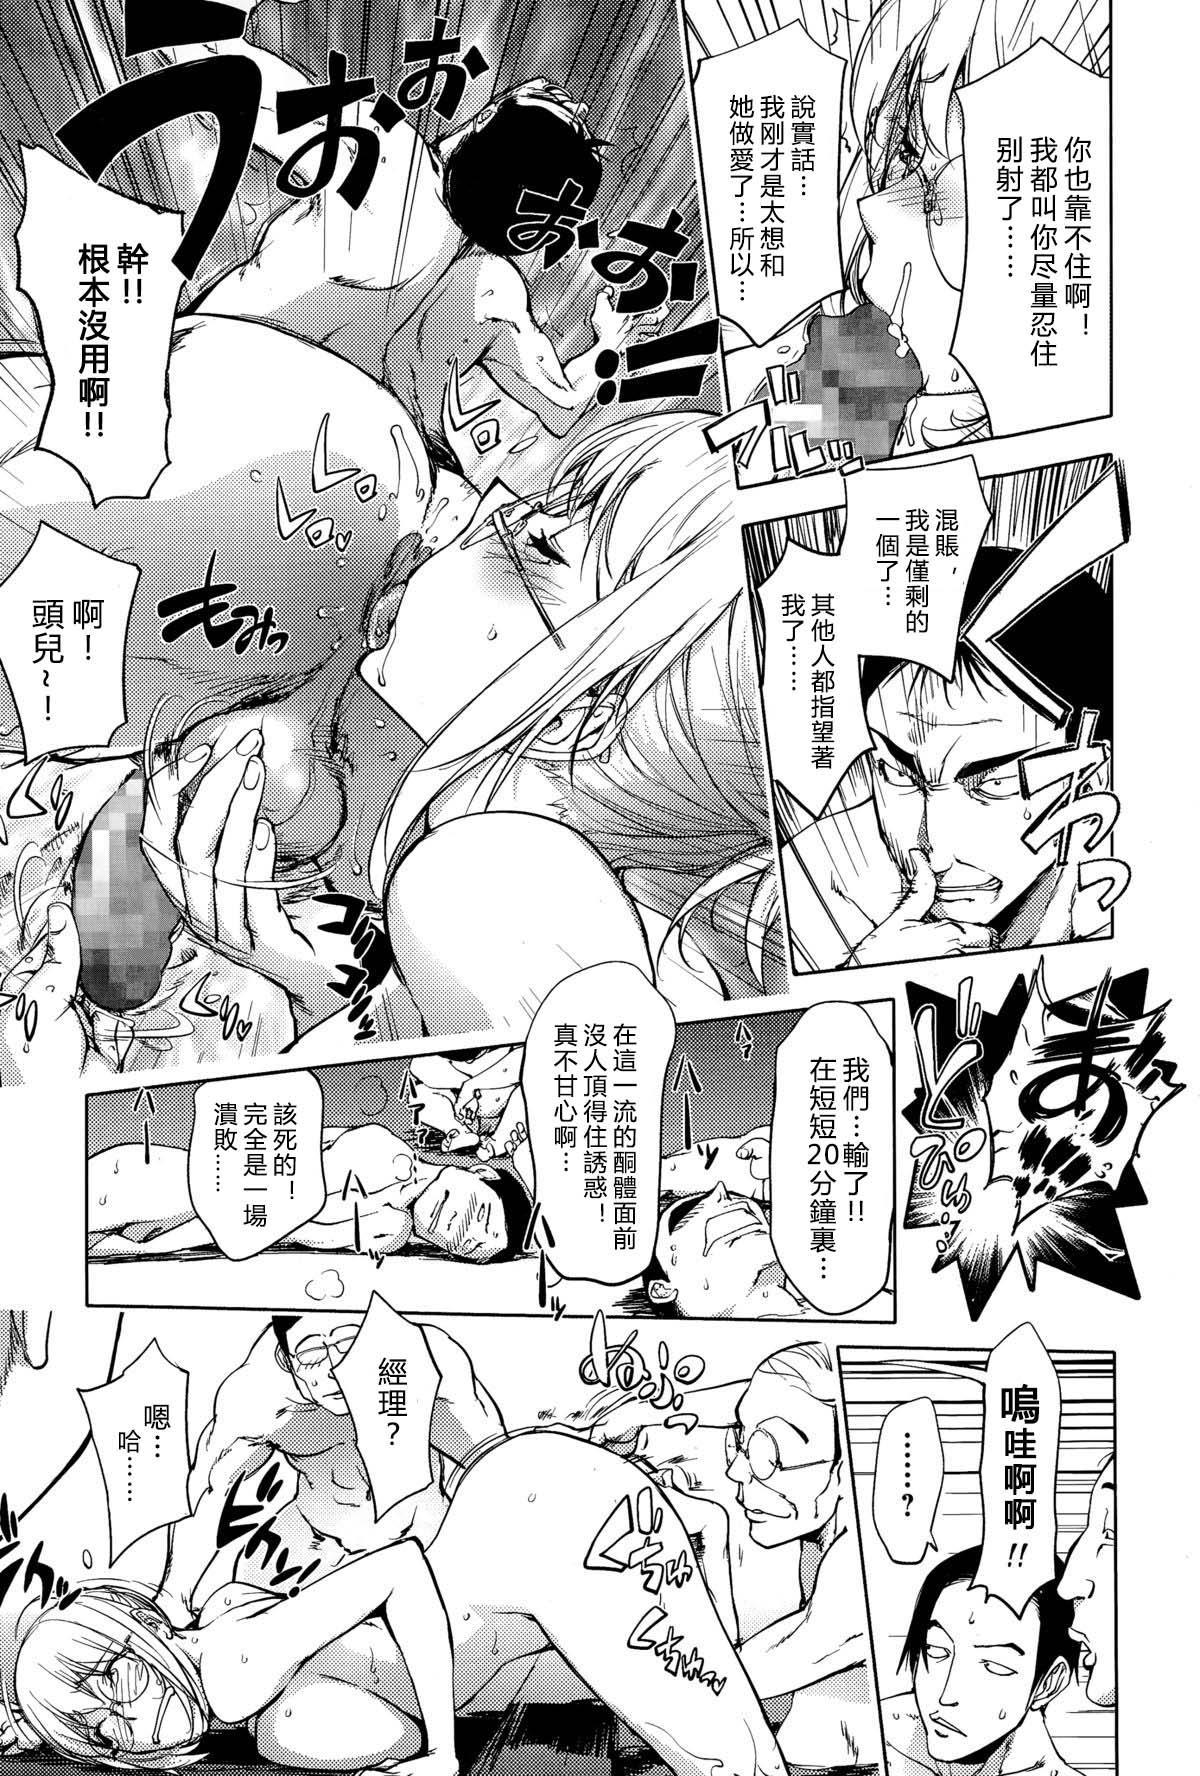 [Kon-kit] Yukemuri no Naka no Kaya-nee!   Kaya-nee At The Hotsprings (Comic Toutetsu 2015-02 Vol. 3) [Chinese] [蒟吉人個人漢化] 12